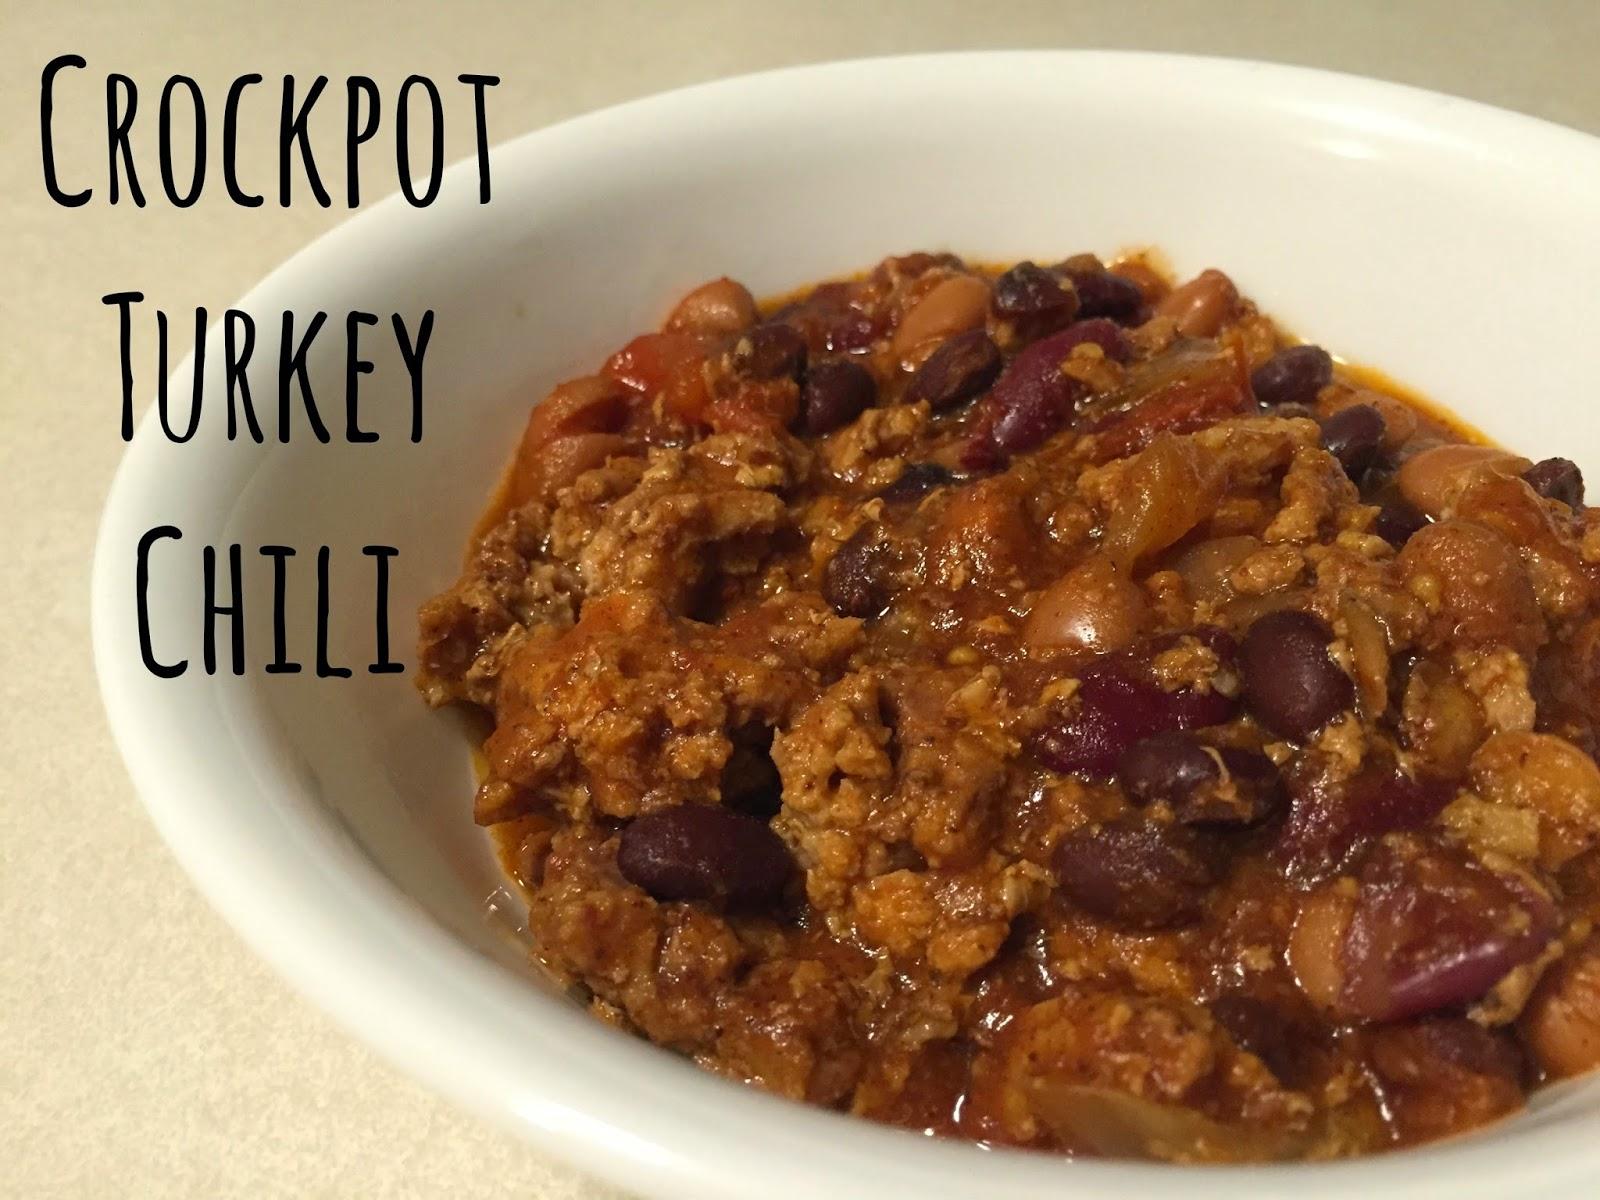 The Simple Life Crockpot Turkey Chili